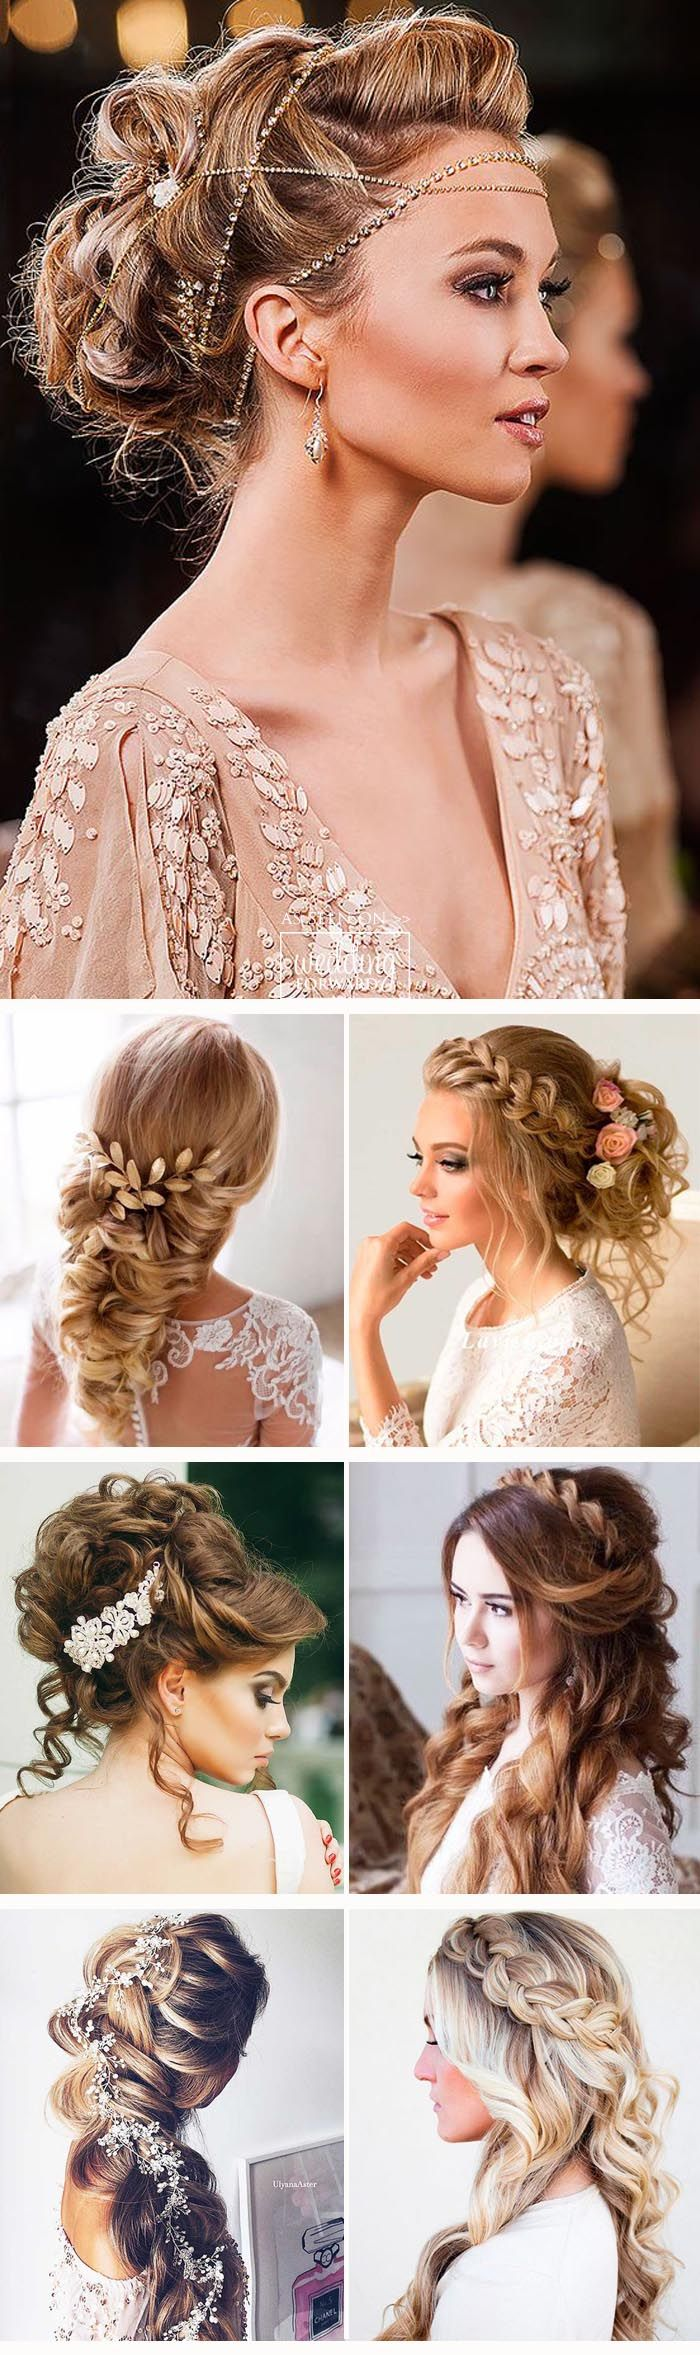 24 Greek Wedding Hairstyles For The Divine Brides ❤ Greek wedding hairstyles a...